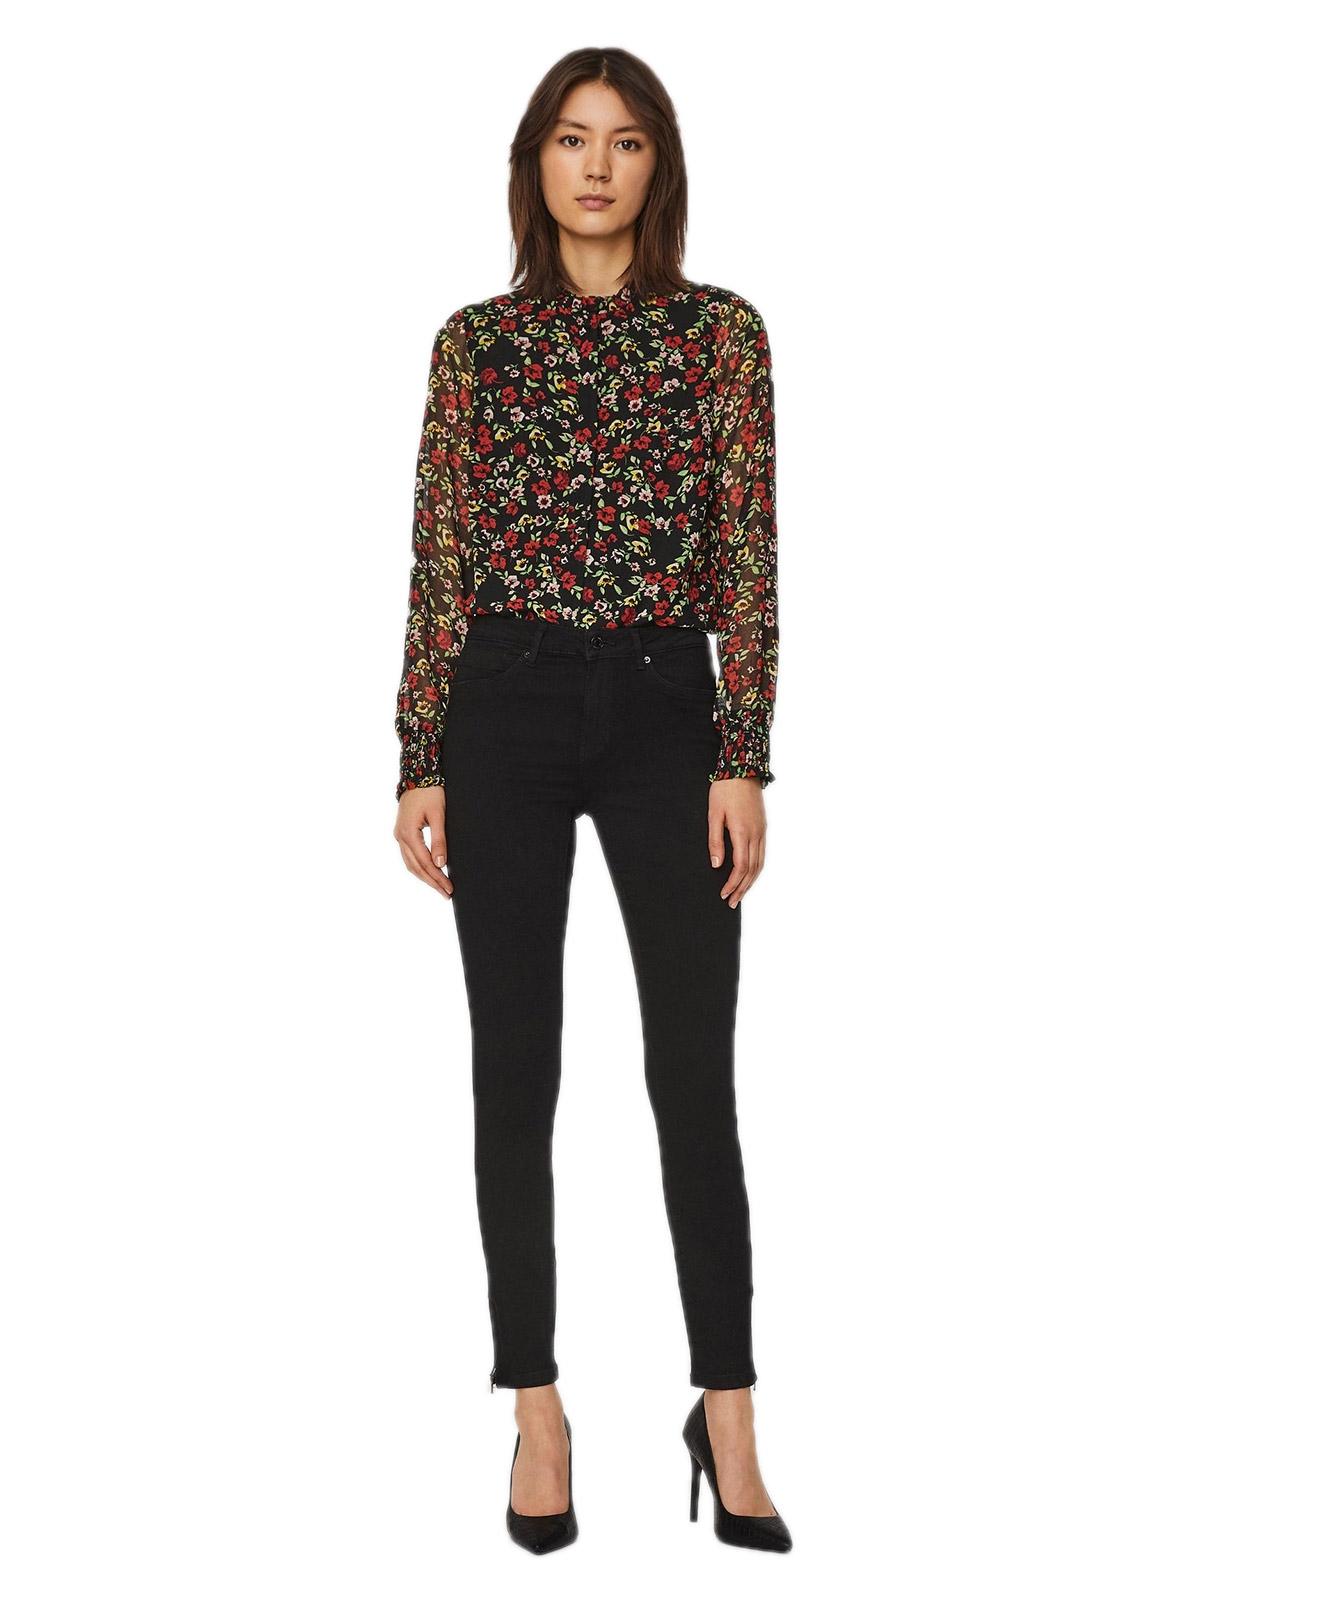 Hosen - Vero Moda Skinny Jeans Tilde in Dark Blue Denim  - Onlineshop Jeans Meile